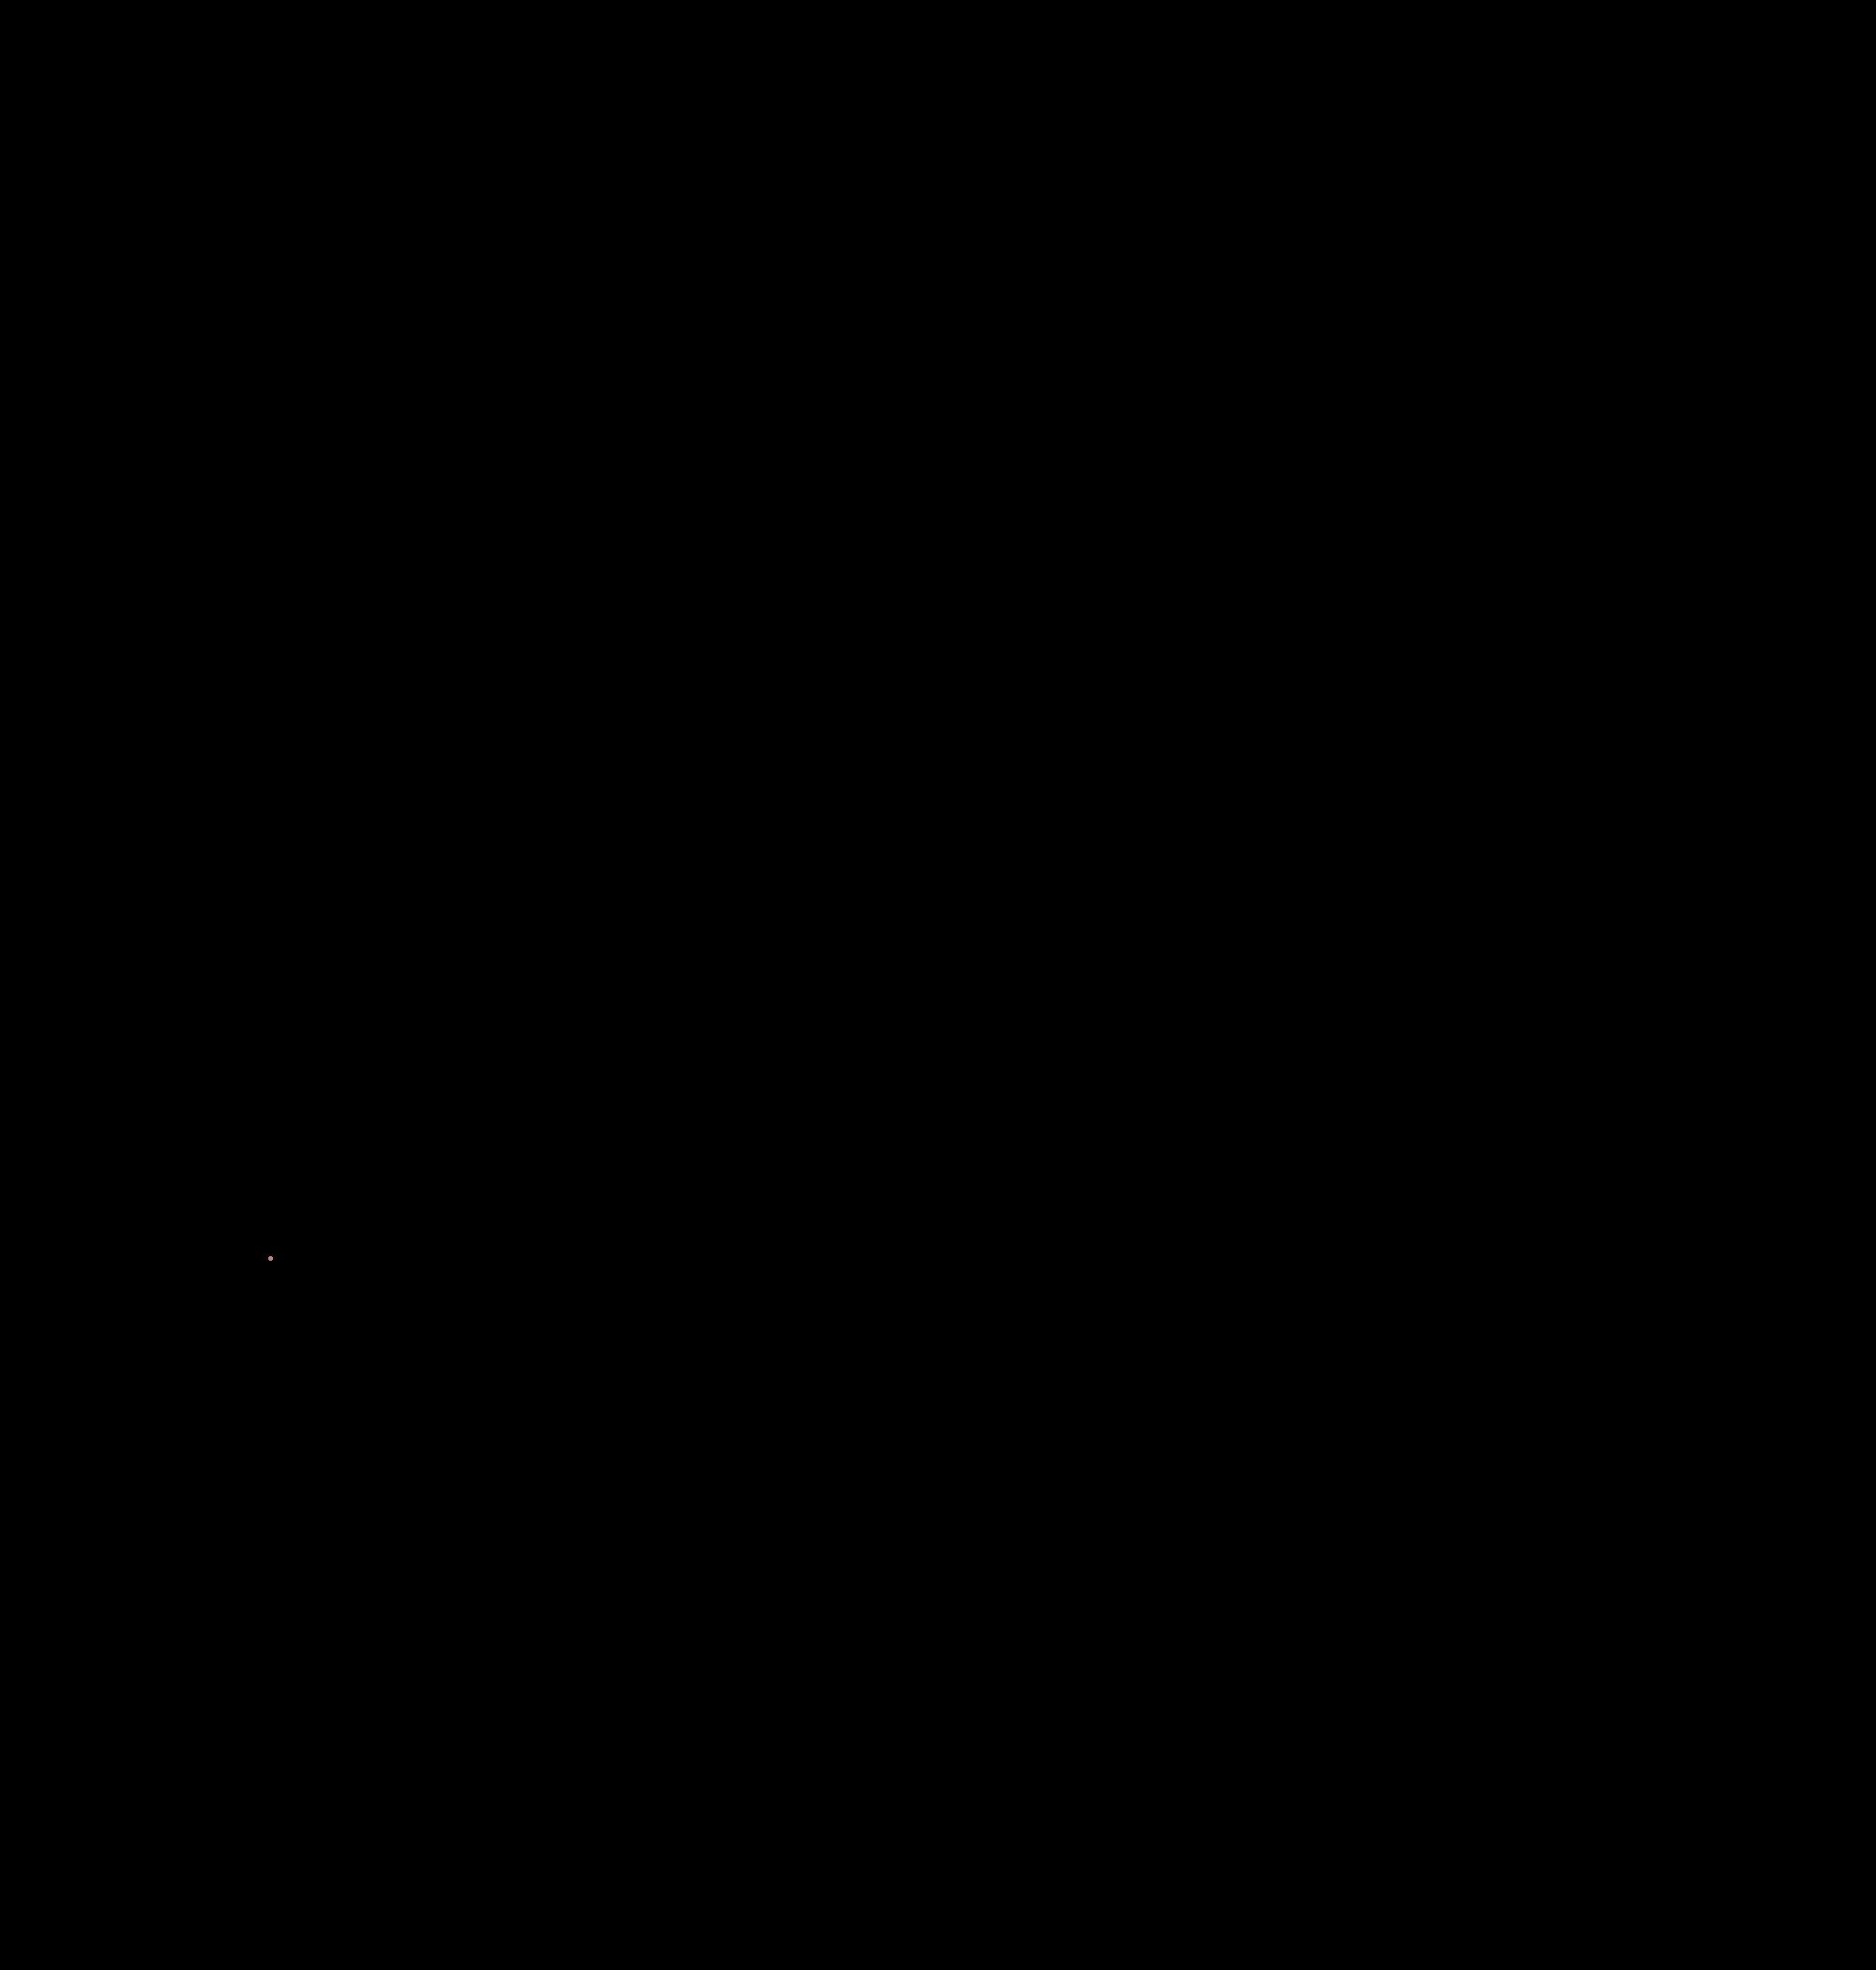 раскраска фейри тейл нацу прокисшей сметаны